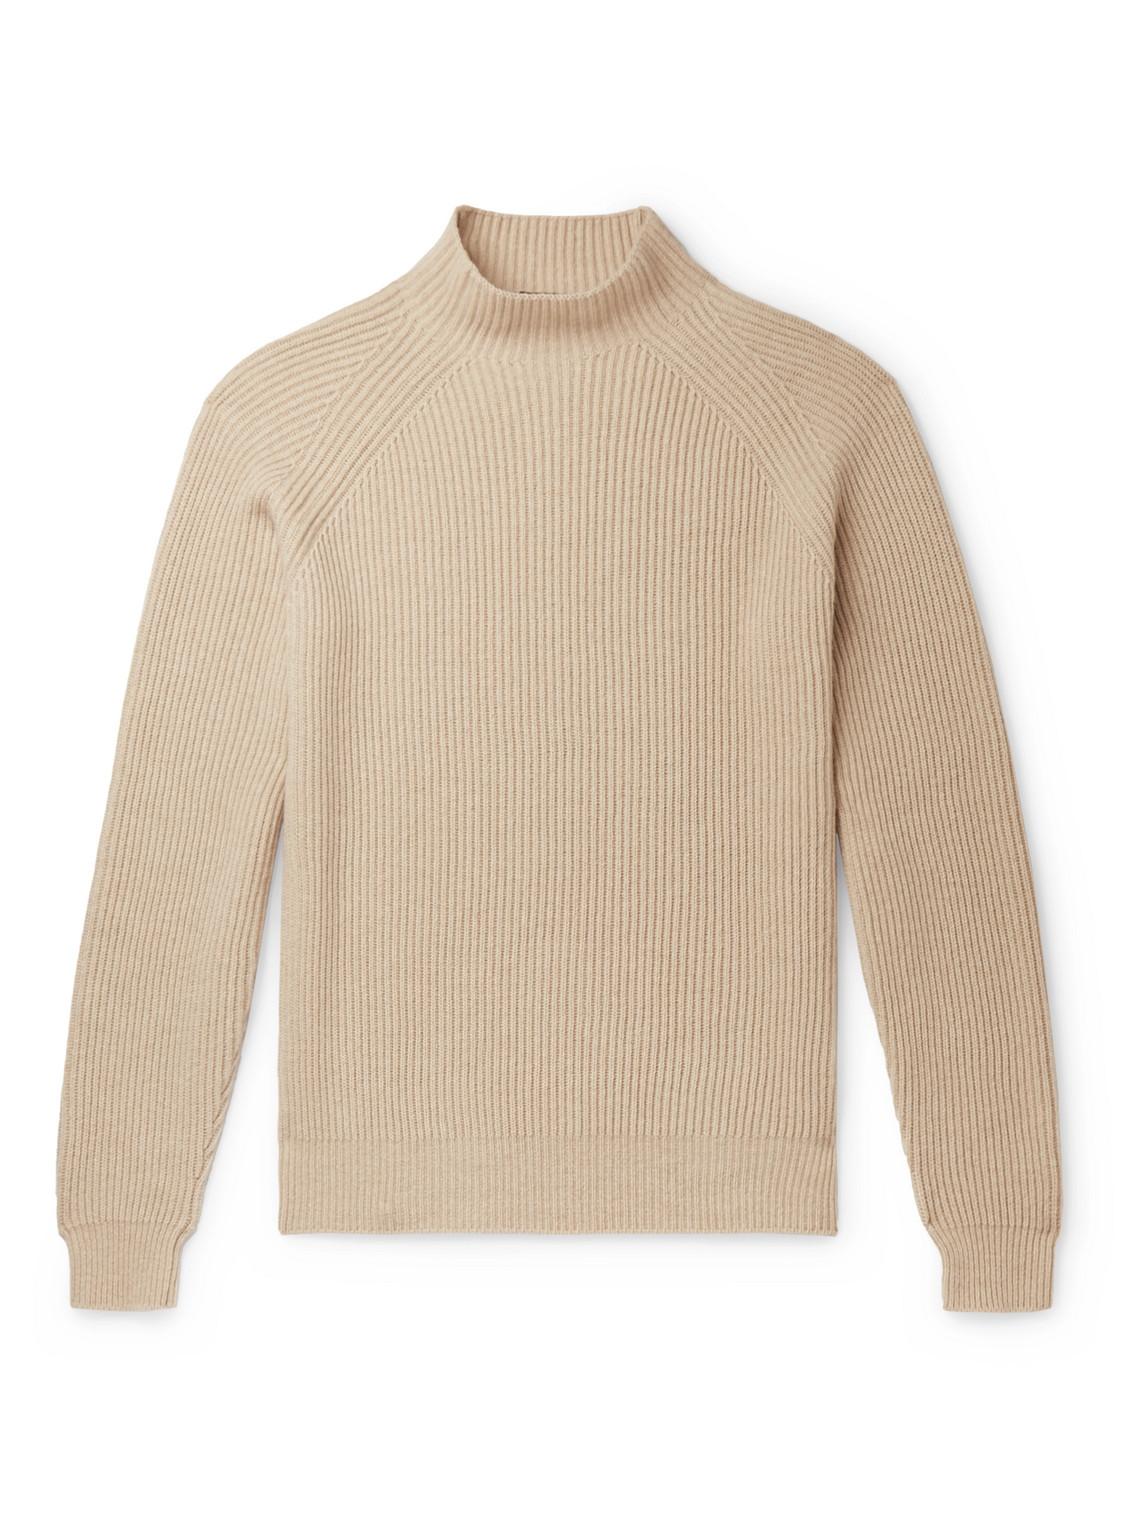 loro piana - ribbed baby cashmere mock-neck sweater - men - neutrals - it 54